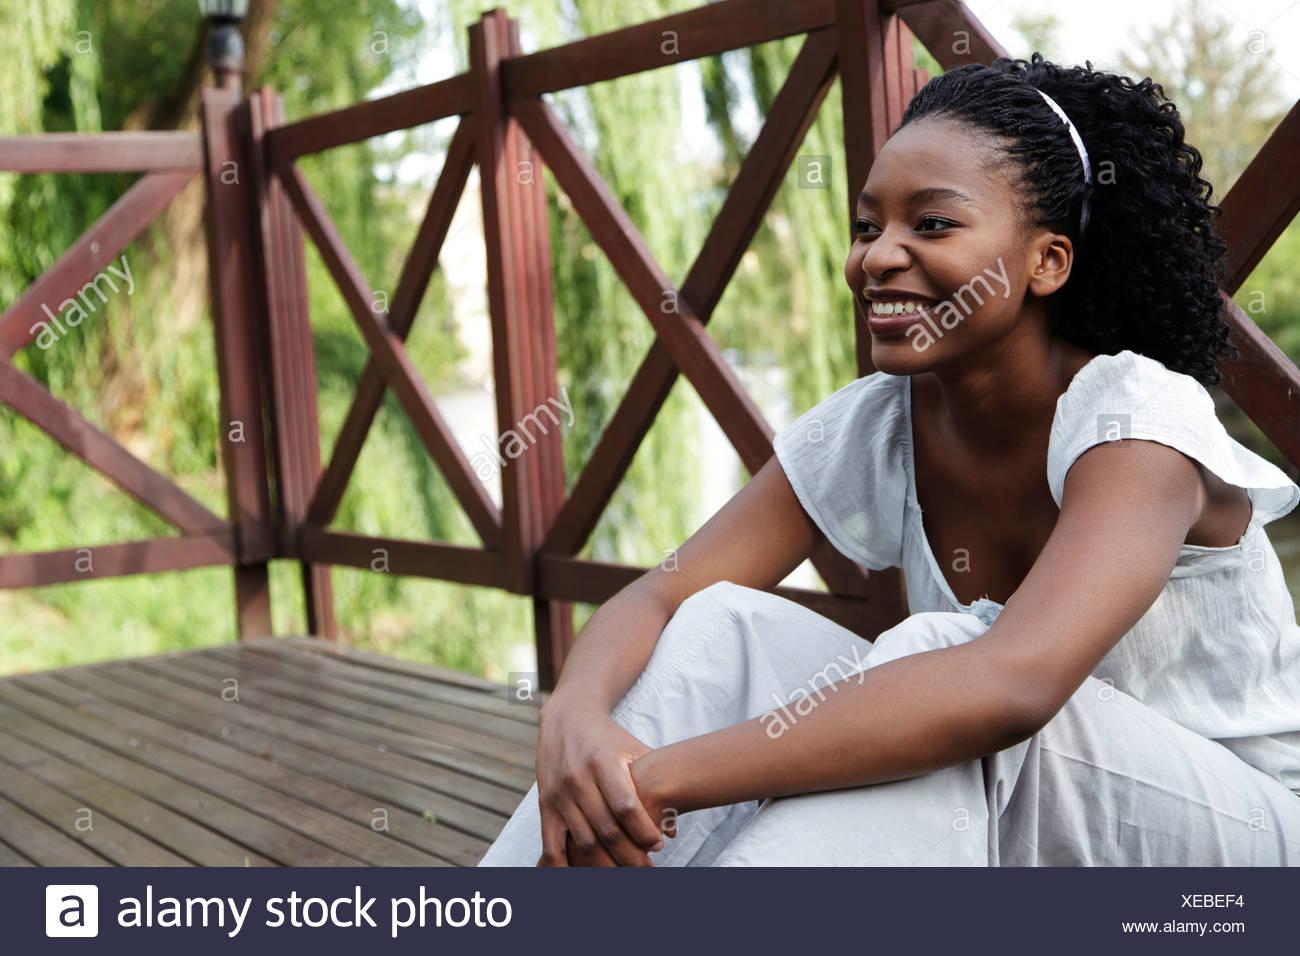 Joven africana se asienta sobre una plataforma de madera Foto de stock